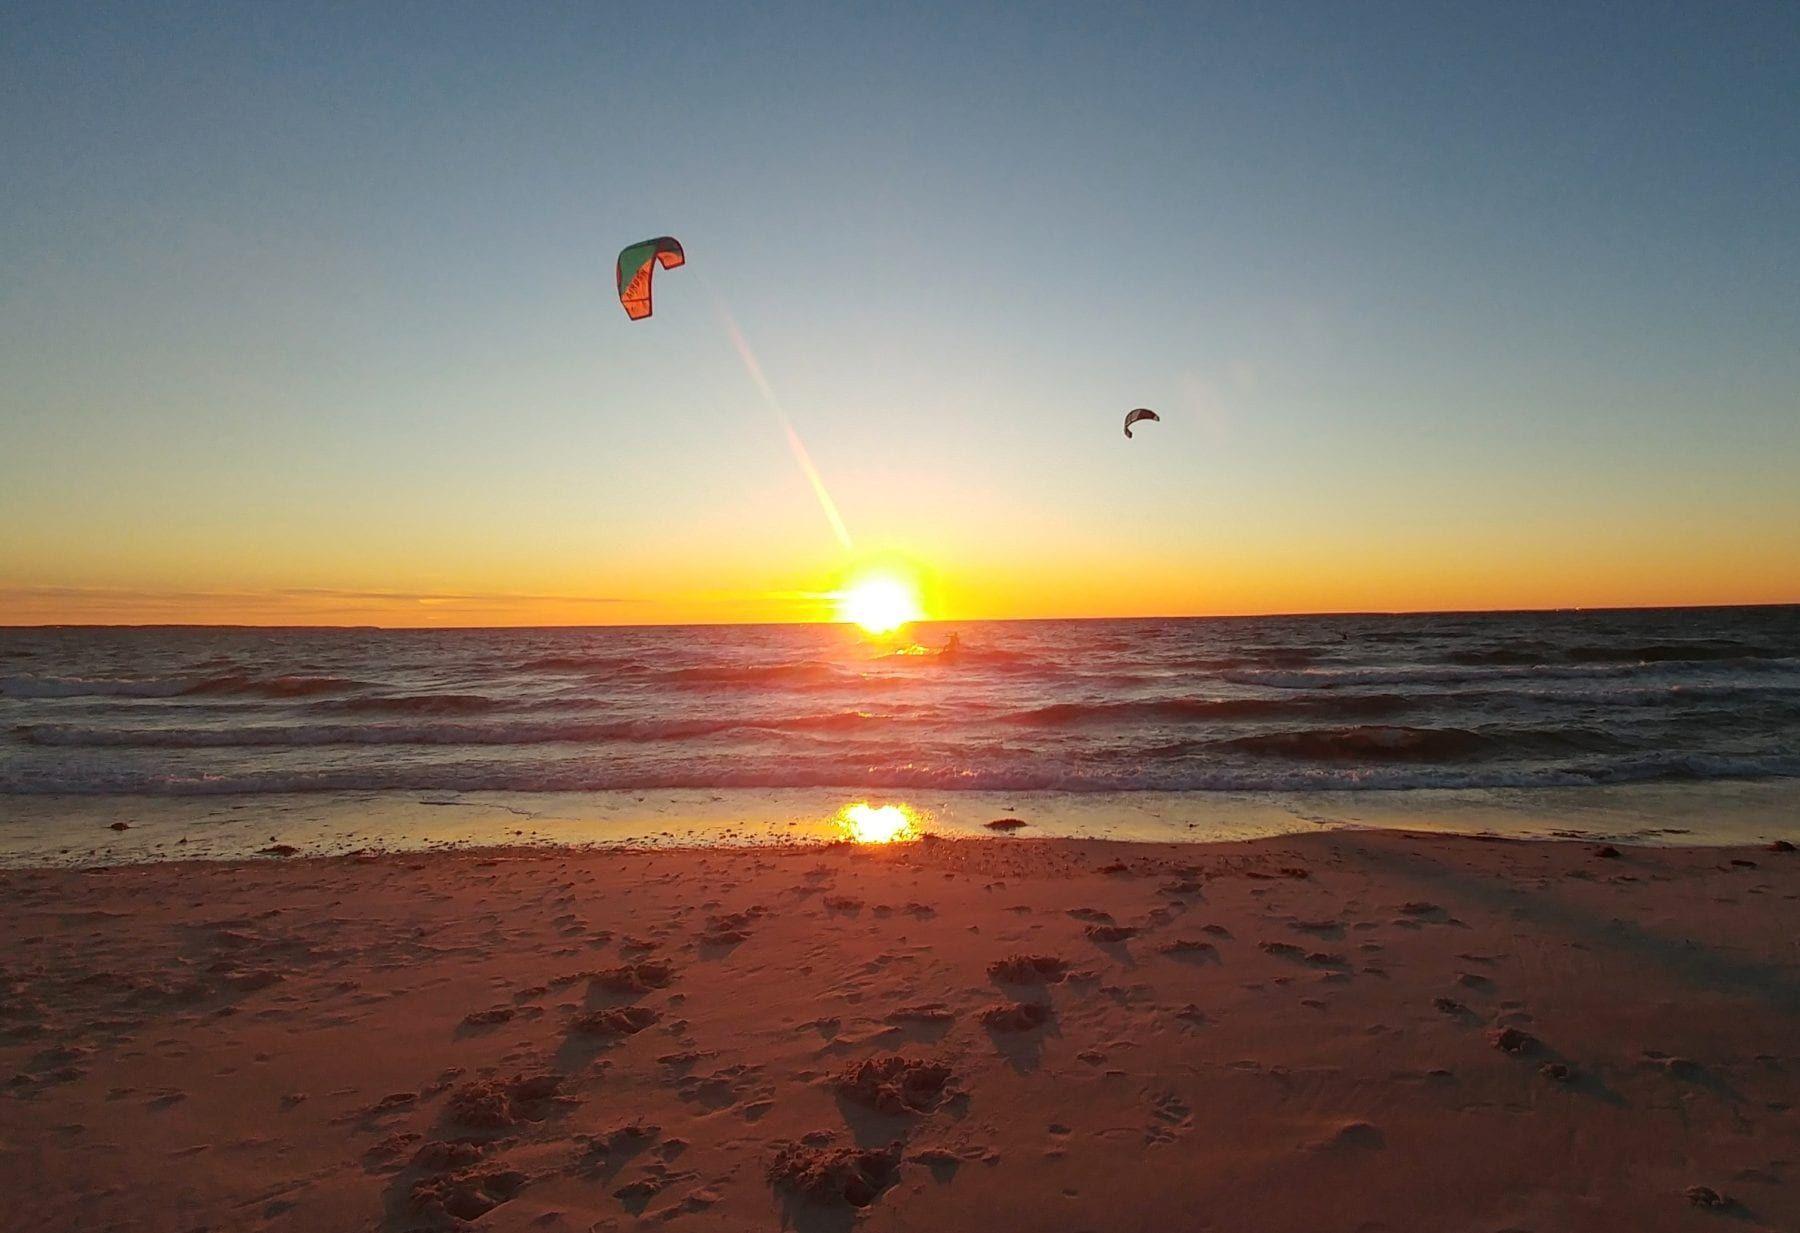 Kite Surfing, Falmouth, MA